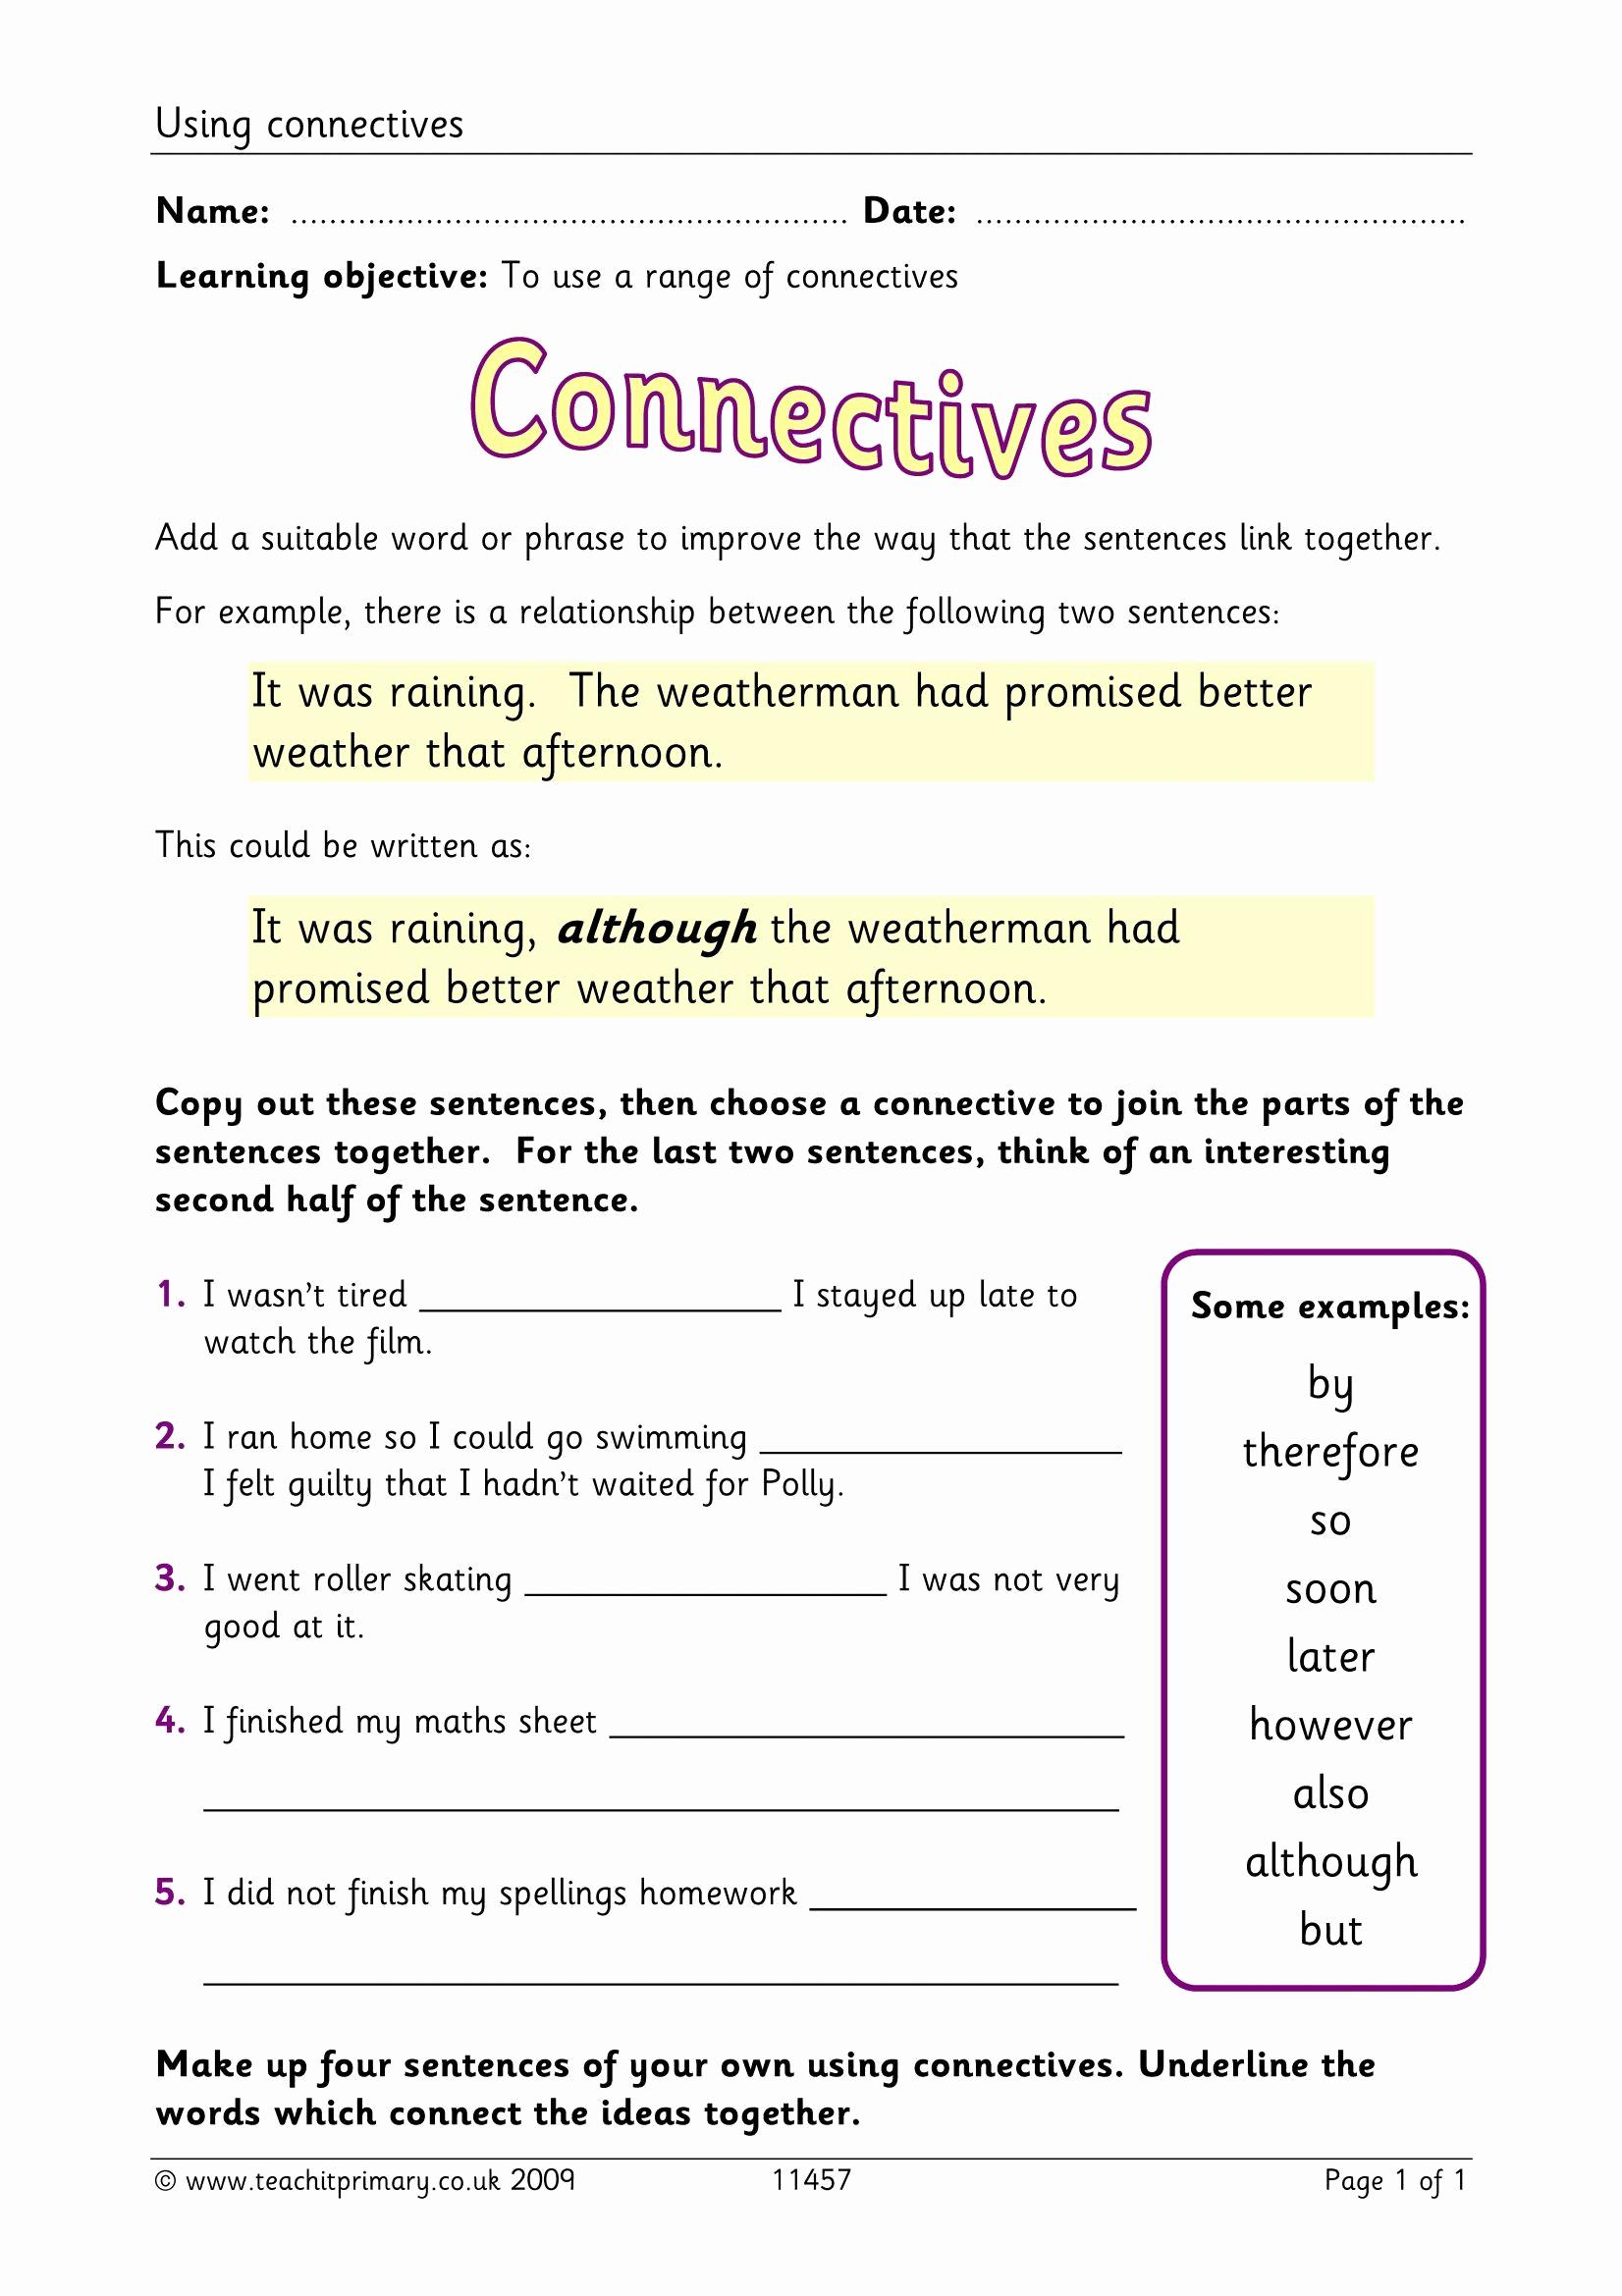 Correlative Conjunctions Worksheet 5th Grade Best Of 20 Correlative Conjunctions Worksheet 5th Grade